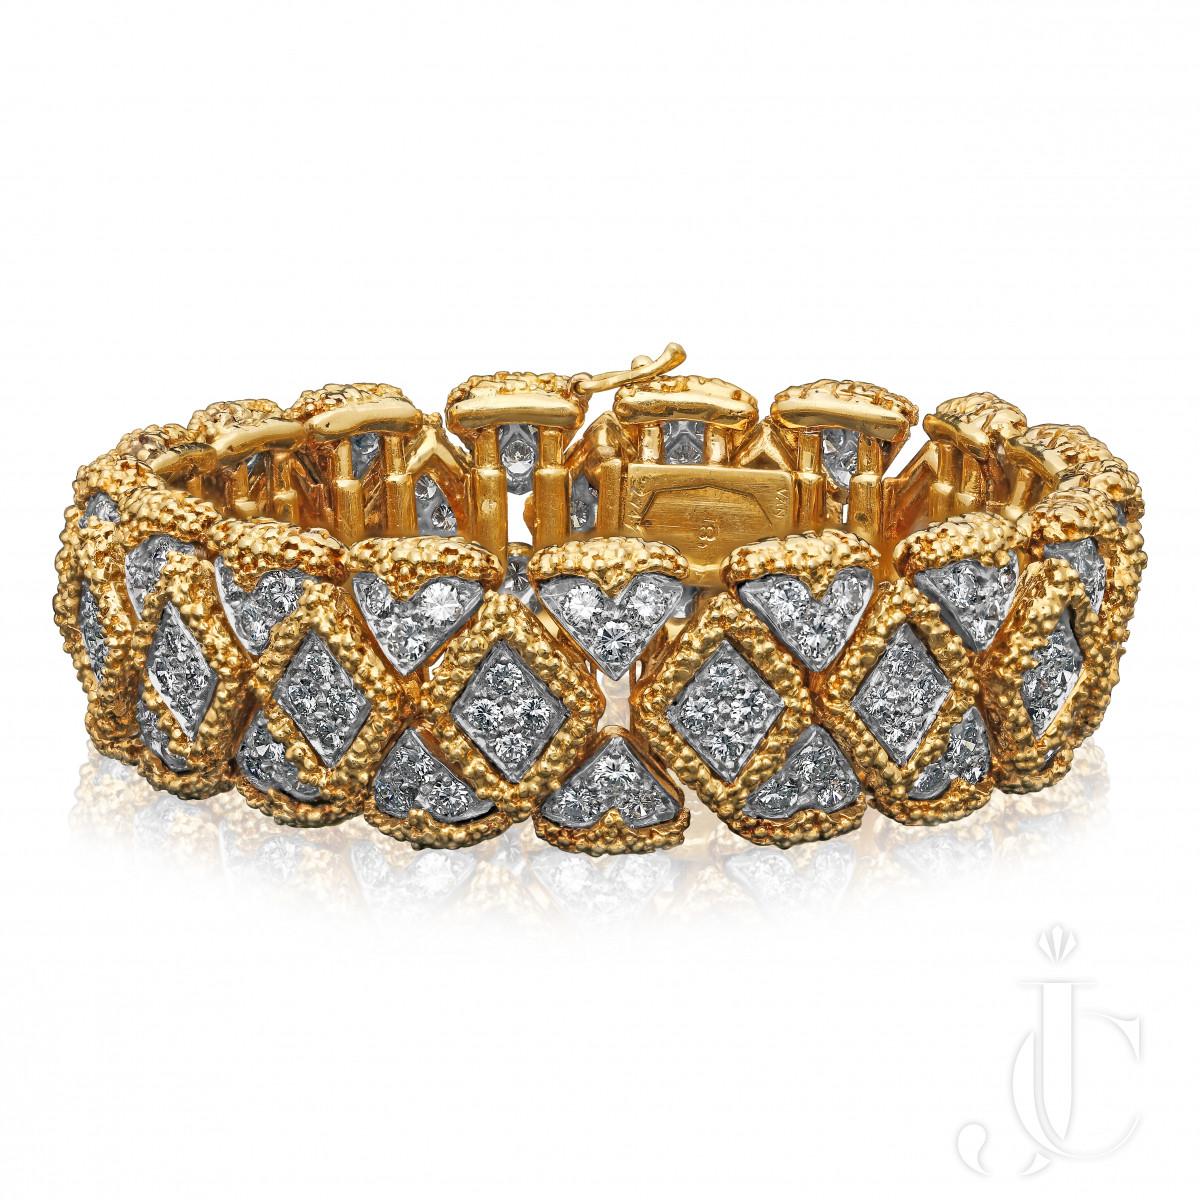 Van Cleef & Arpels Diamond & 18ct Gold Bracelet Paris c.1976